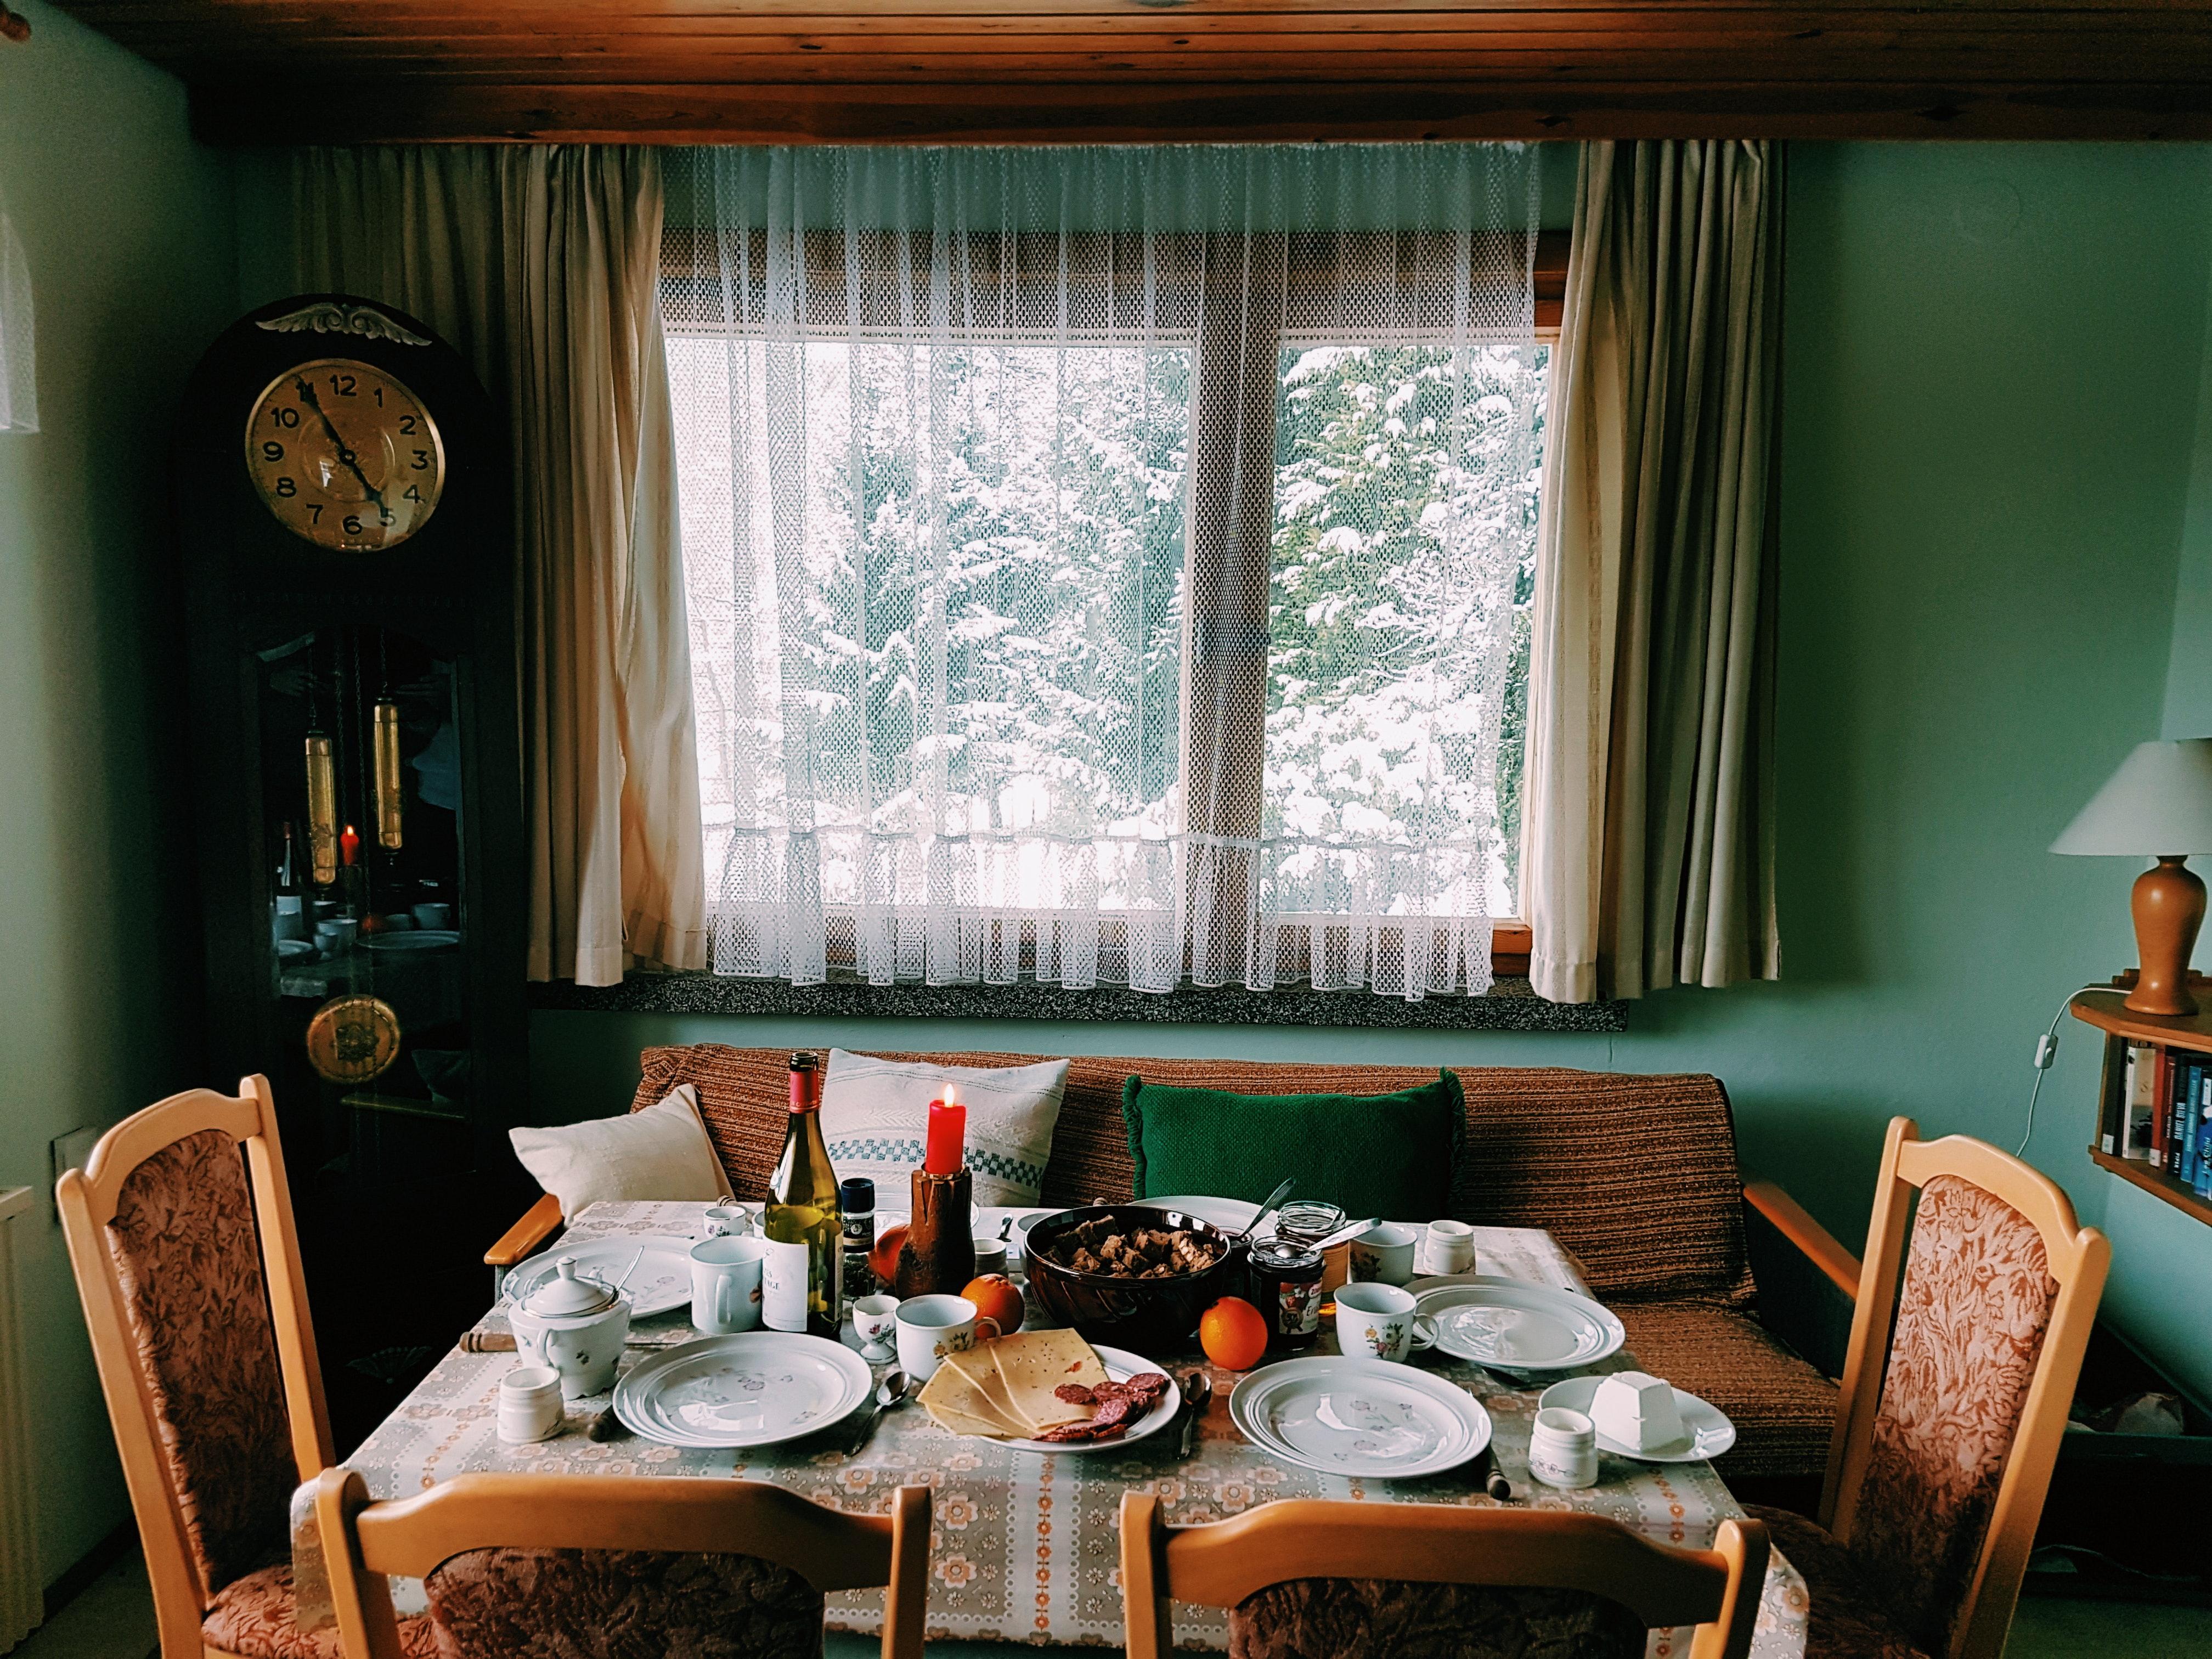 Couchsurfing, WarmShowers, Bewelcome, Airbnb, Homestay, Flipkey, Wimdu